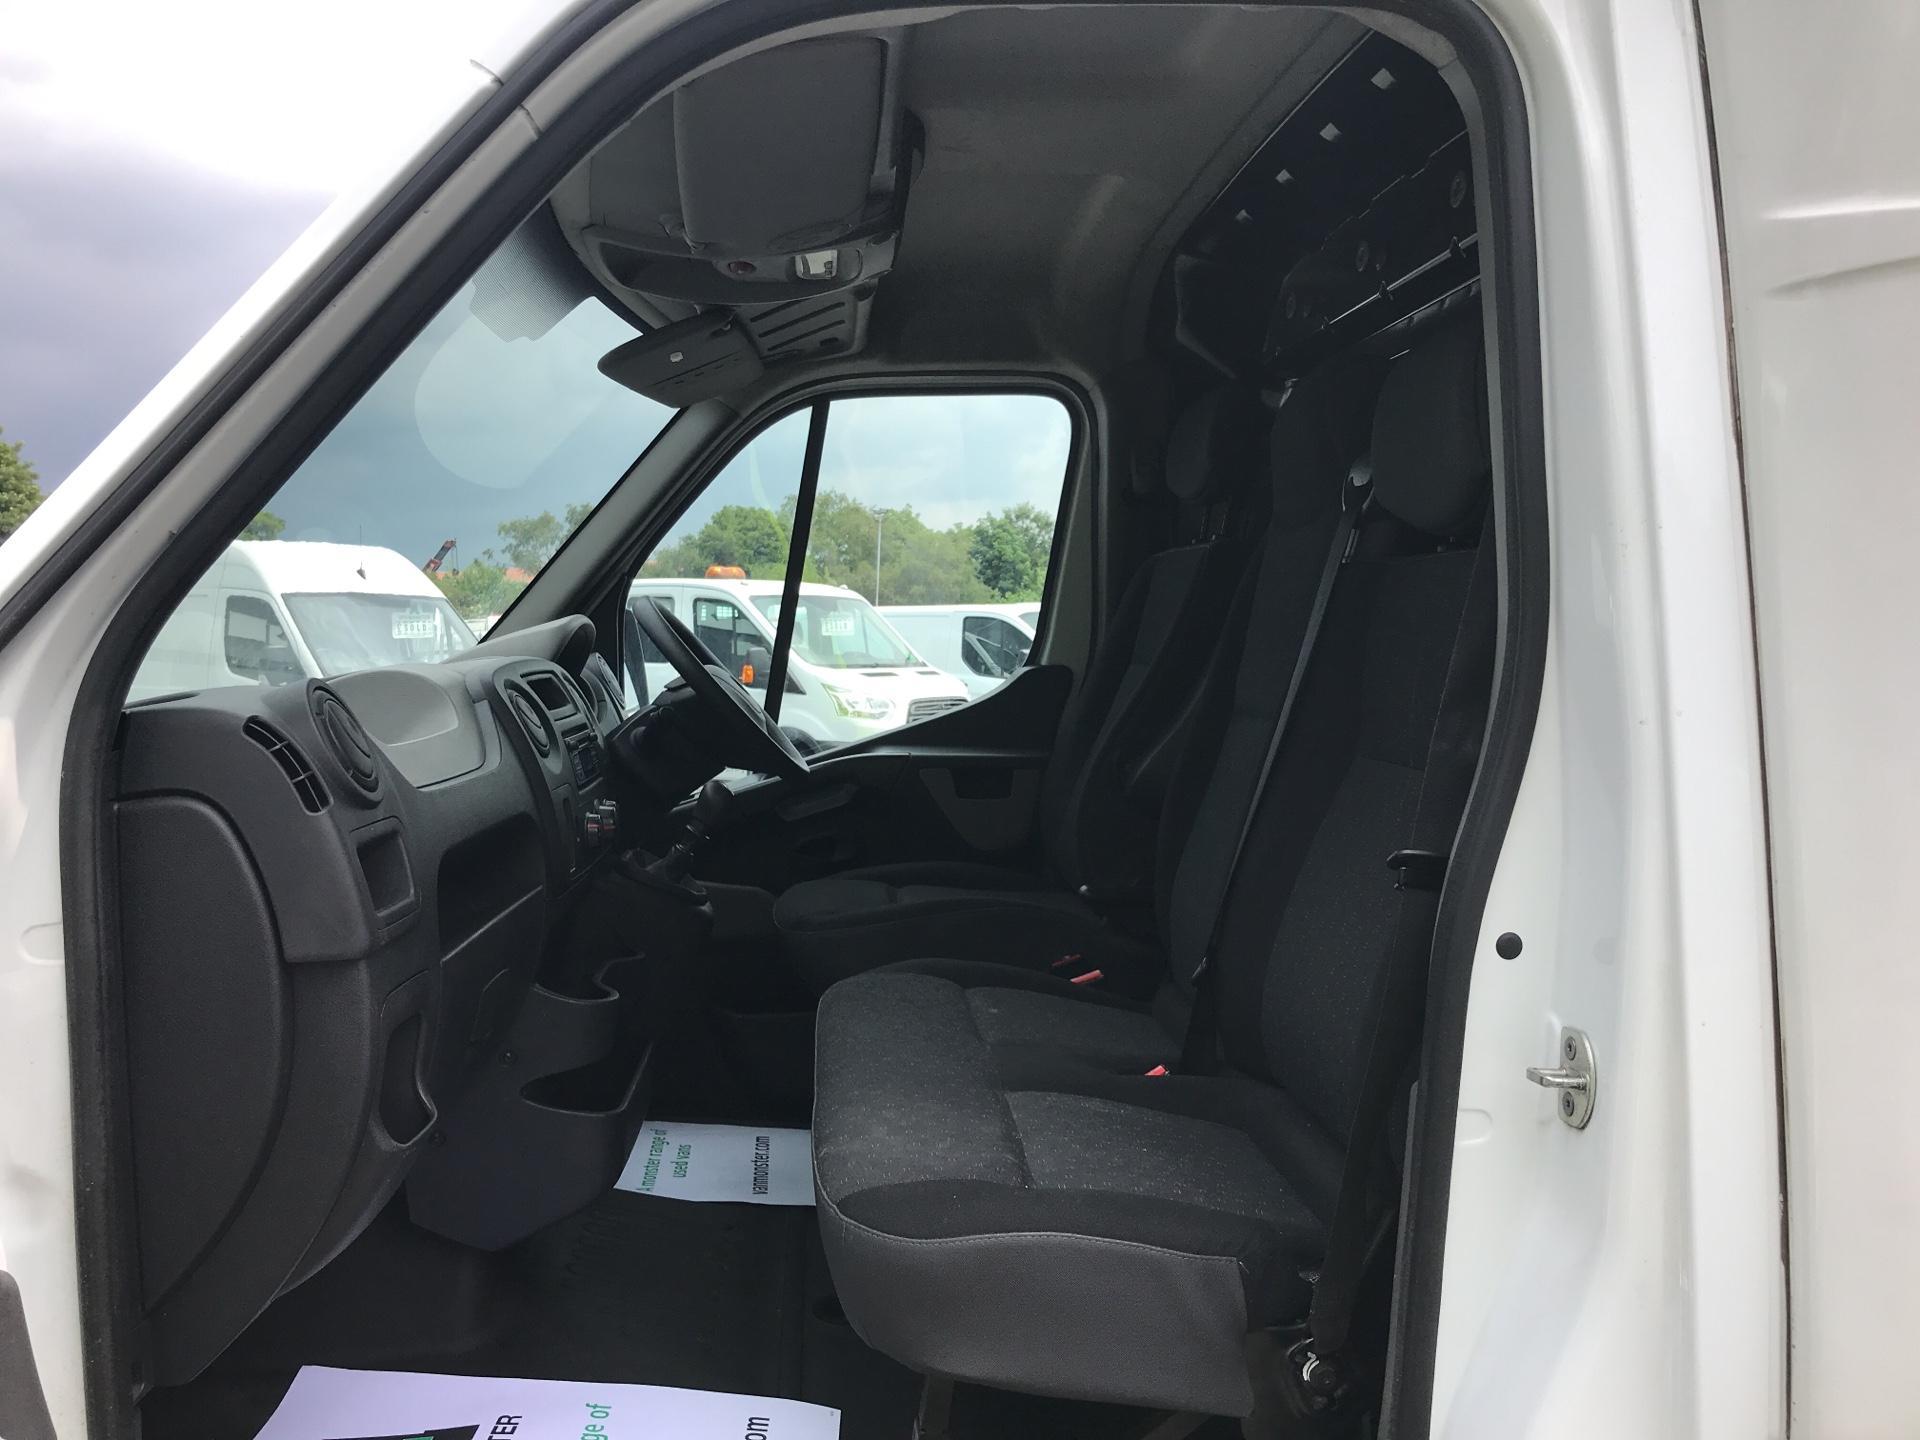 2016 Vauxhall Movano 2.3 CDTI BITURBO ECOFLEX H1 LUTON 136PS (DP65ZZB) Image 14